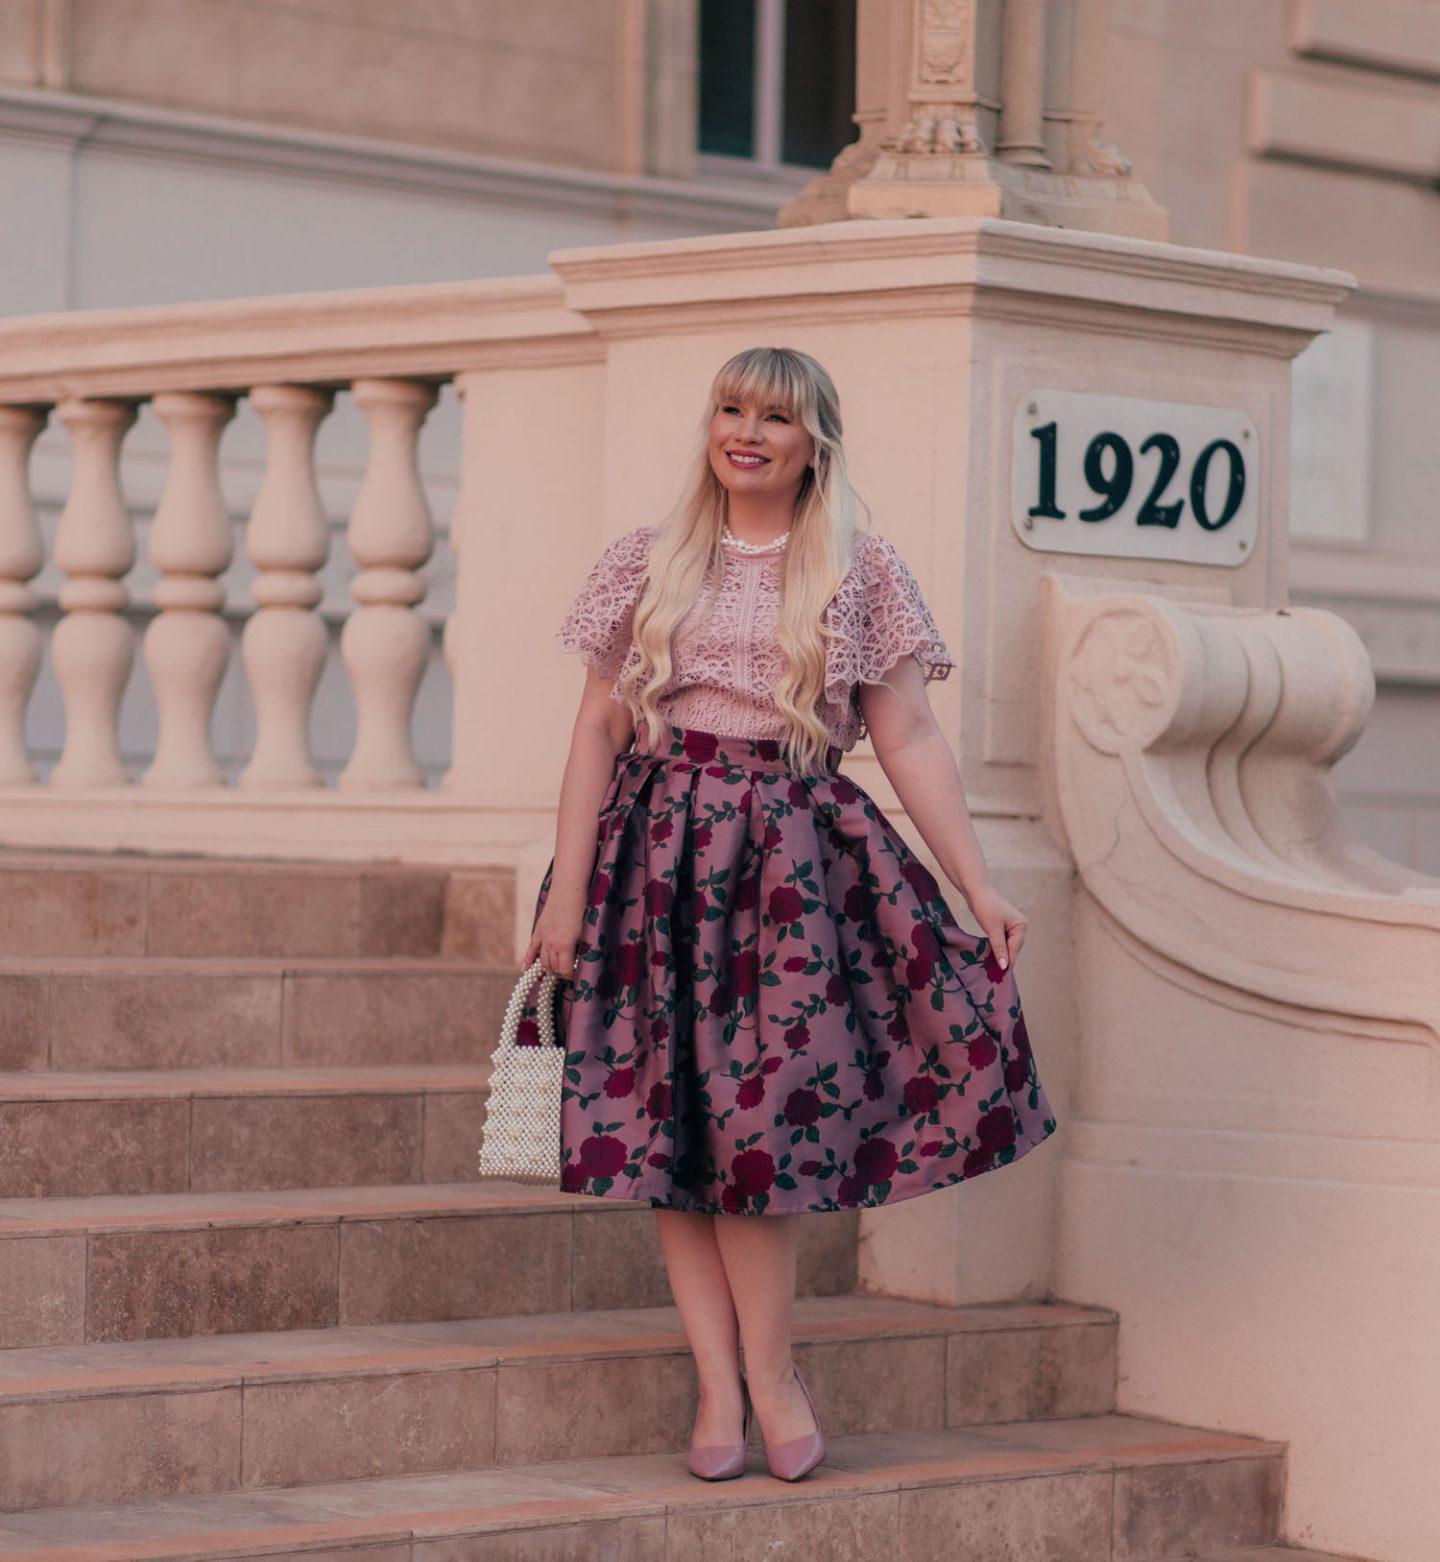 5 Marvelous Ways to Dress More Feminine